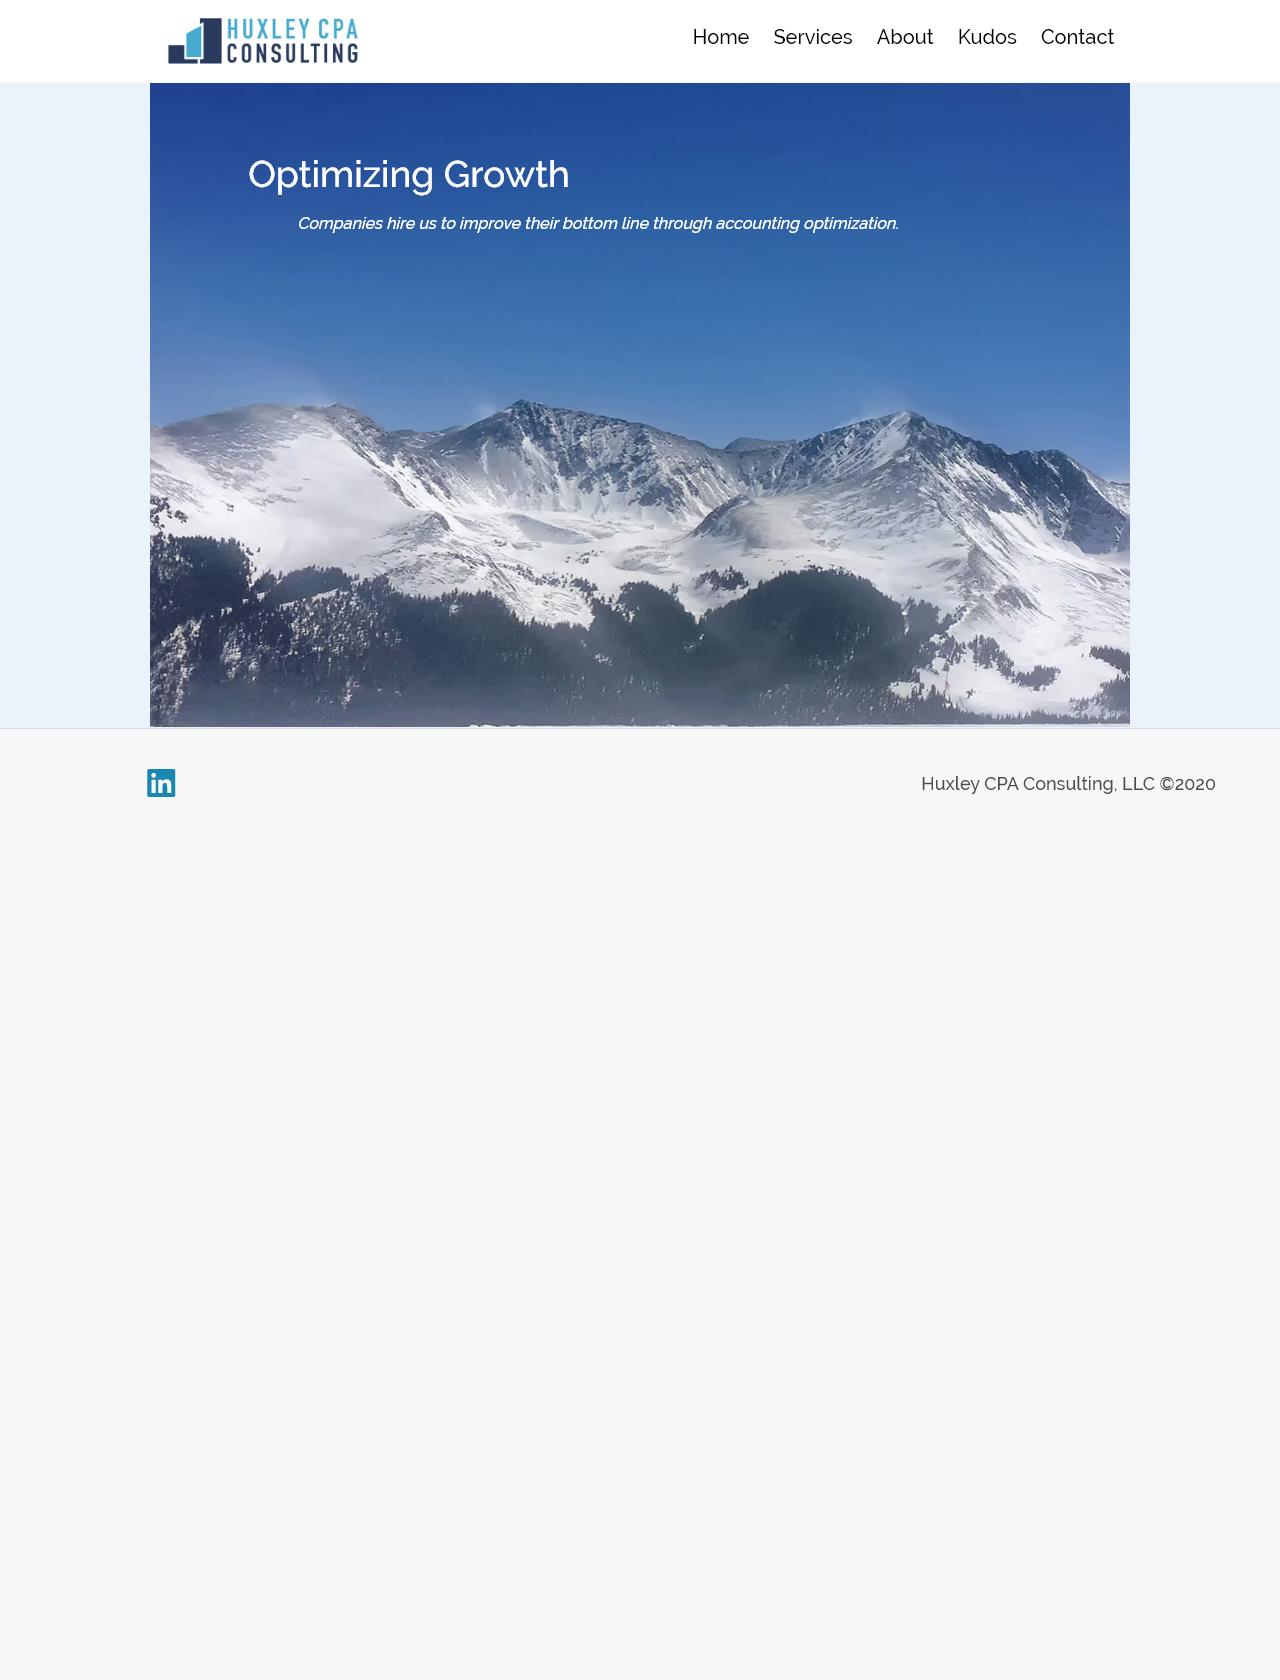 Screenshot Desktop - https://www.huxleycpa.com/